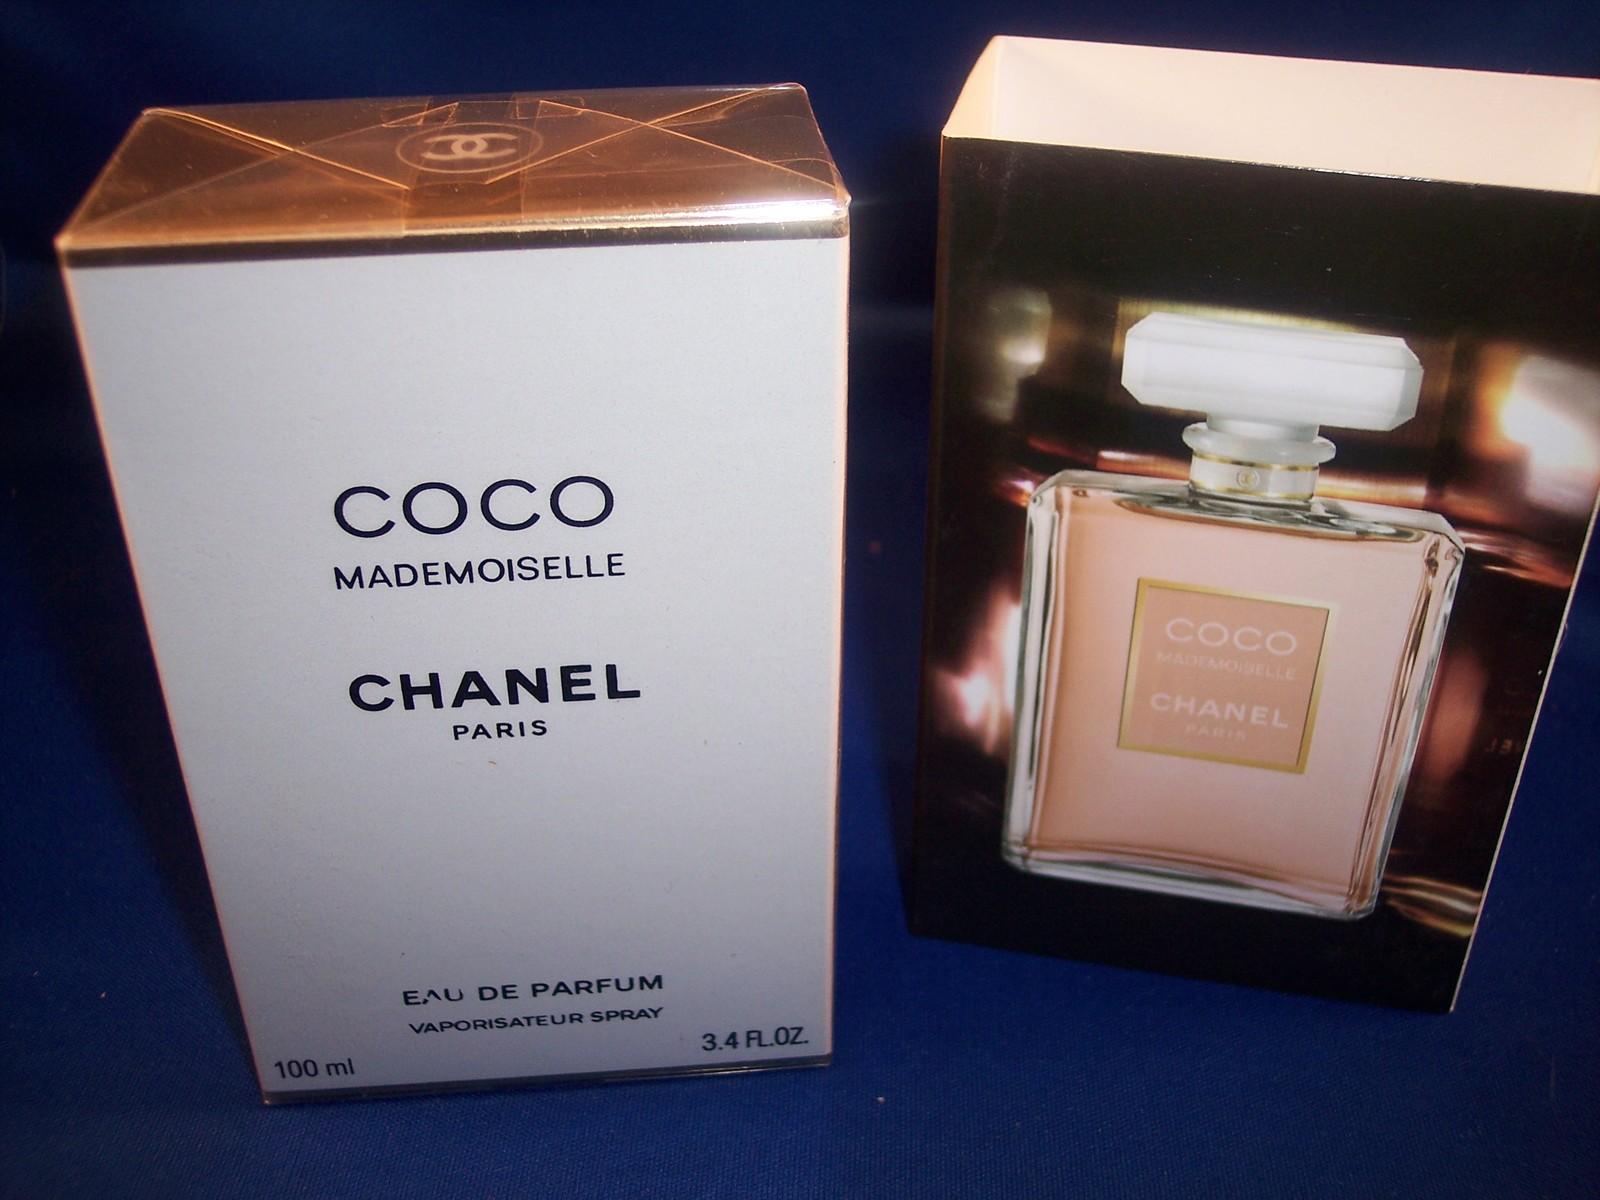 chanel coco mademoiselle eau de parfum spray 3 4 fl oz women. Black Bedroom Furniture Sets. Home Design Ideas